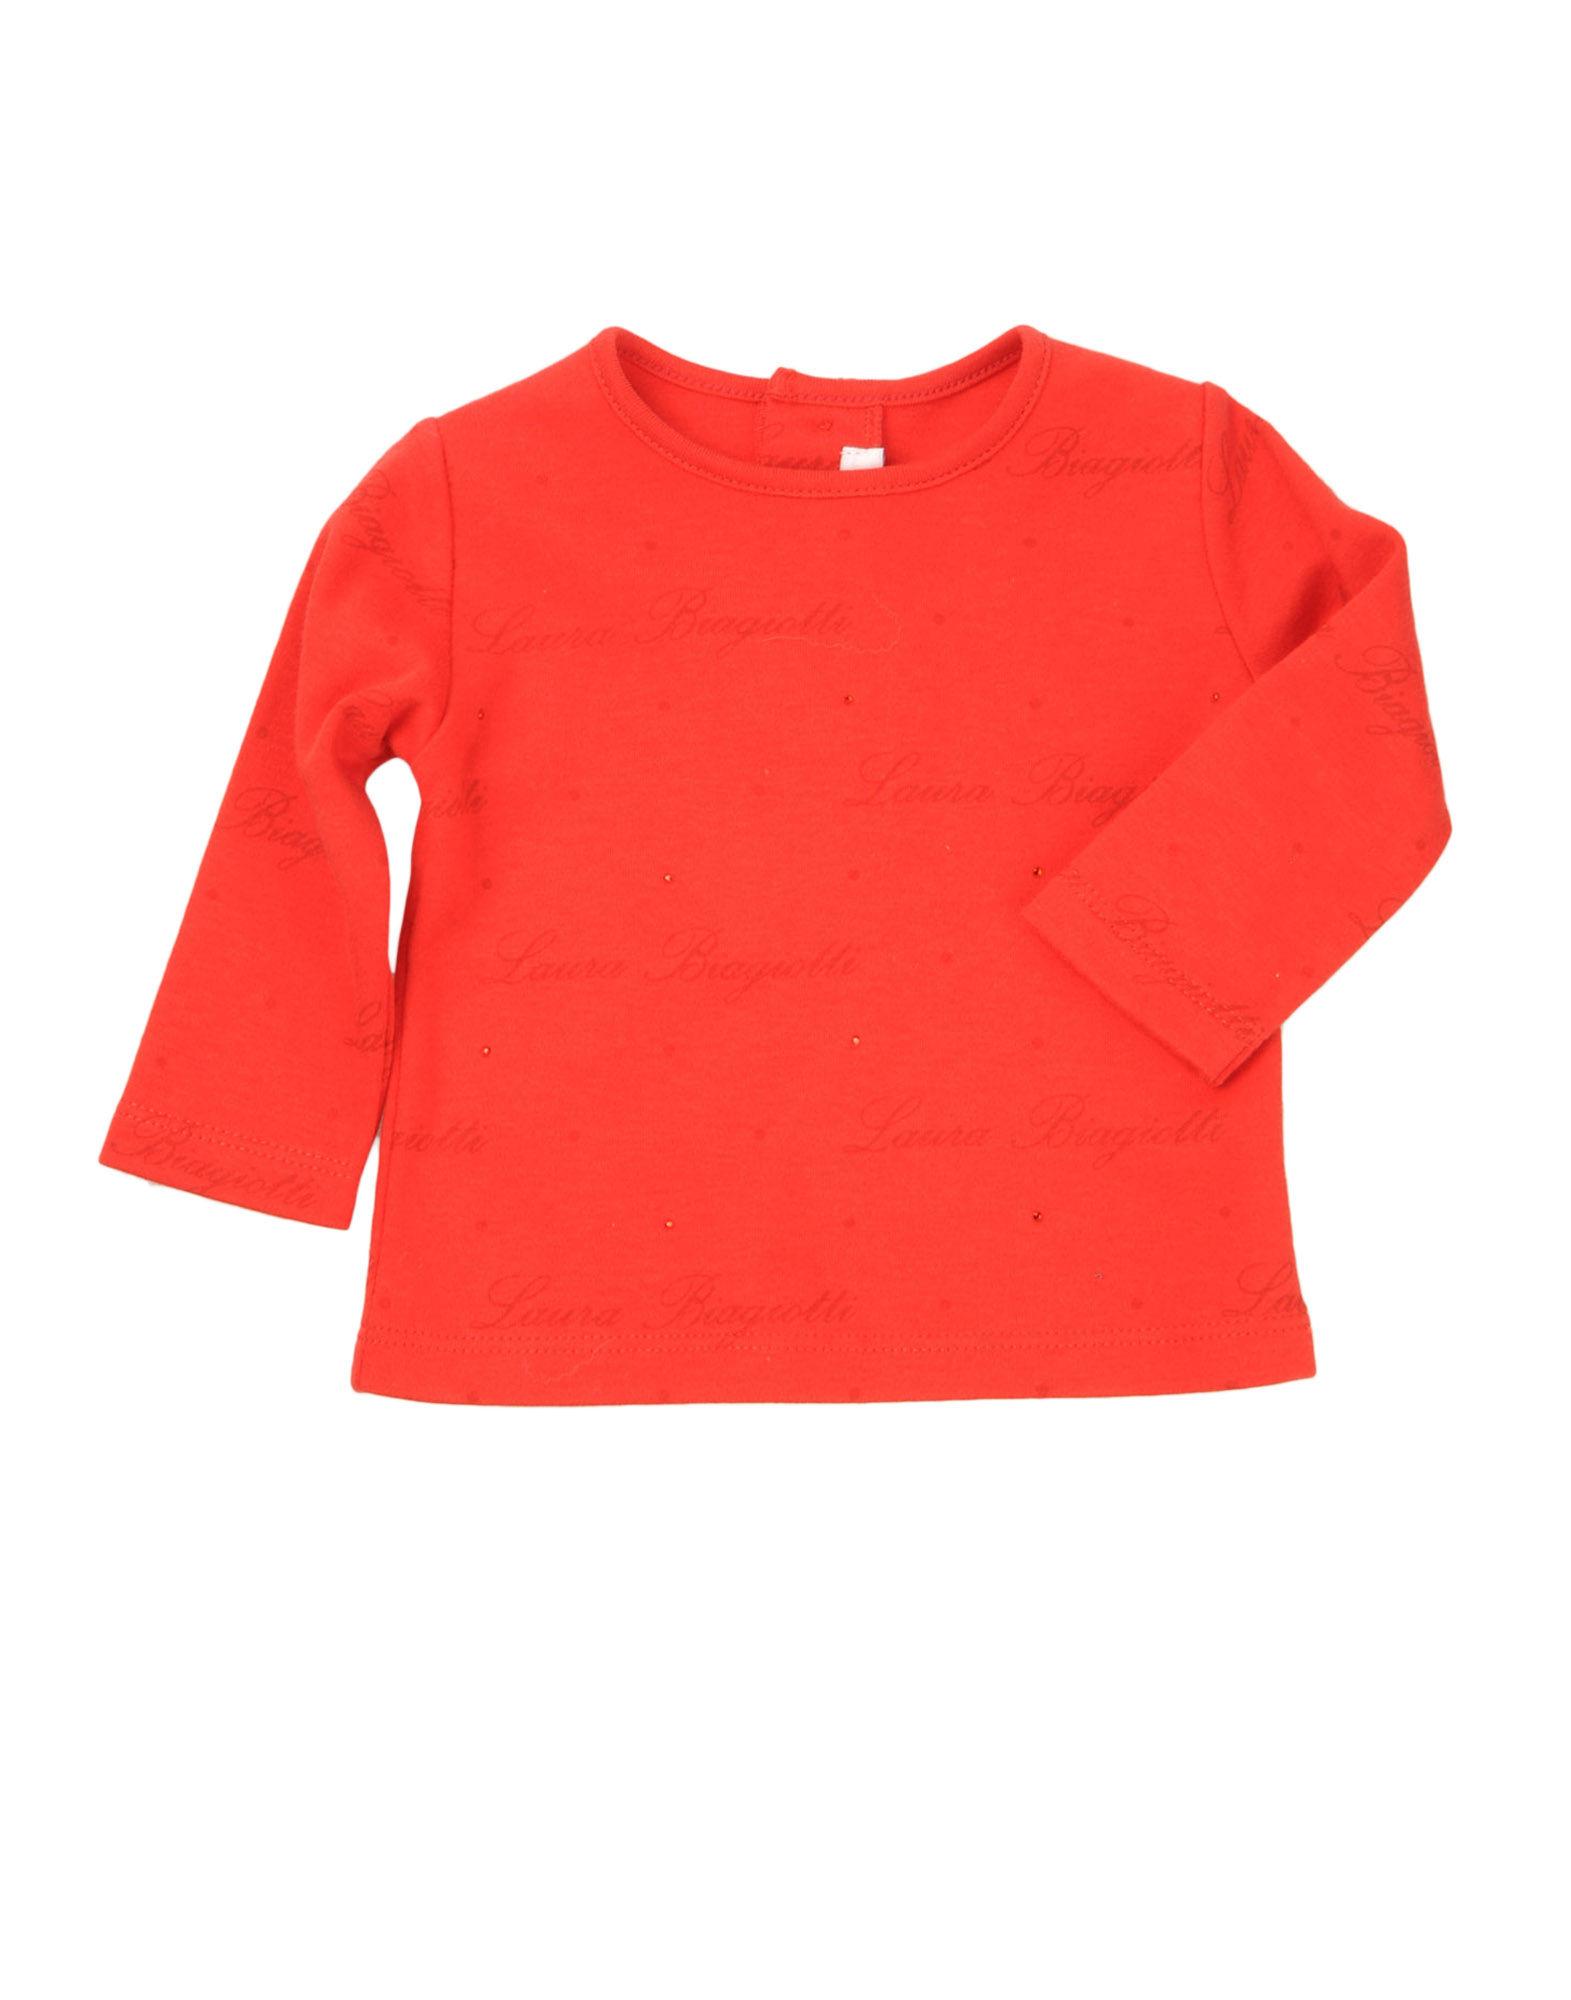 LAURA BIAGIOTTI BABY Mädchen 0-24 monate Langärmliges T-Shirt Farbe Rot Größe 1